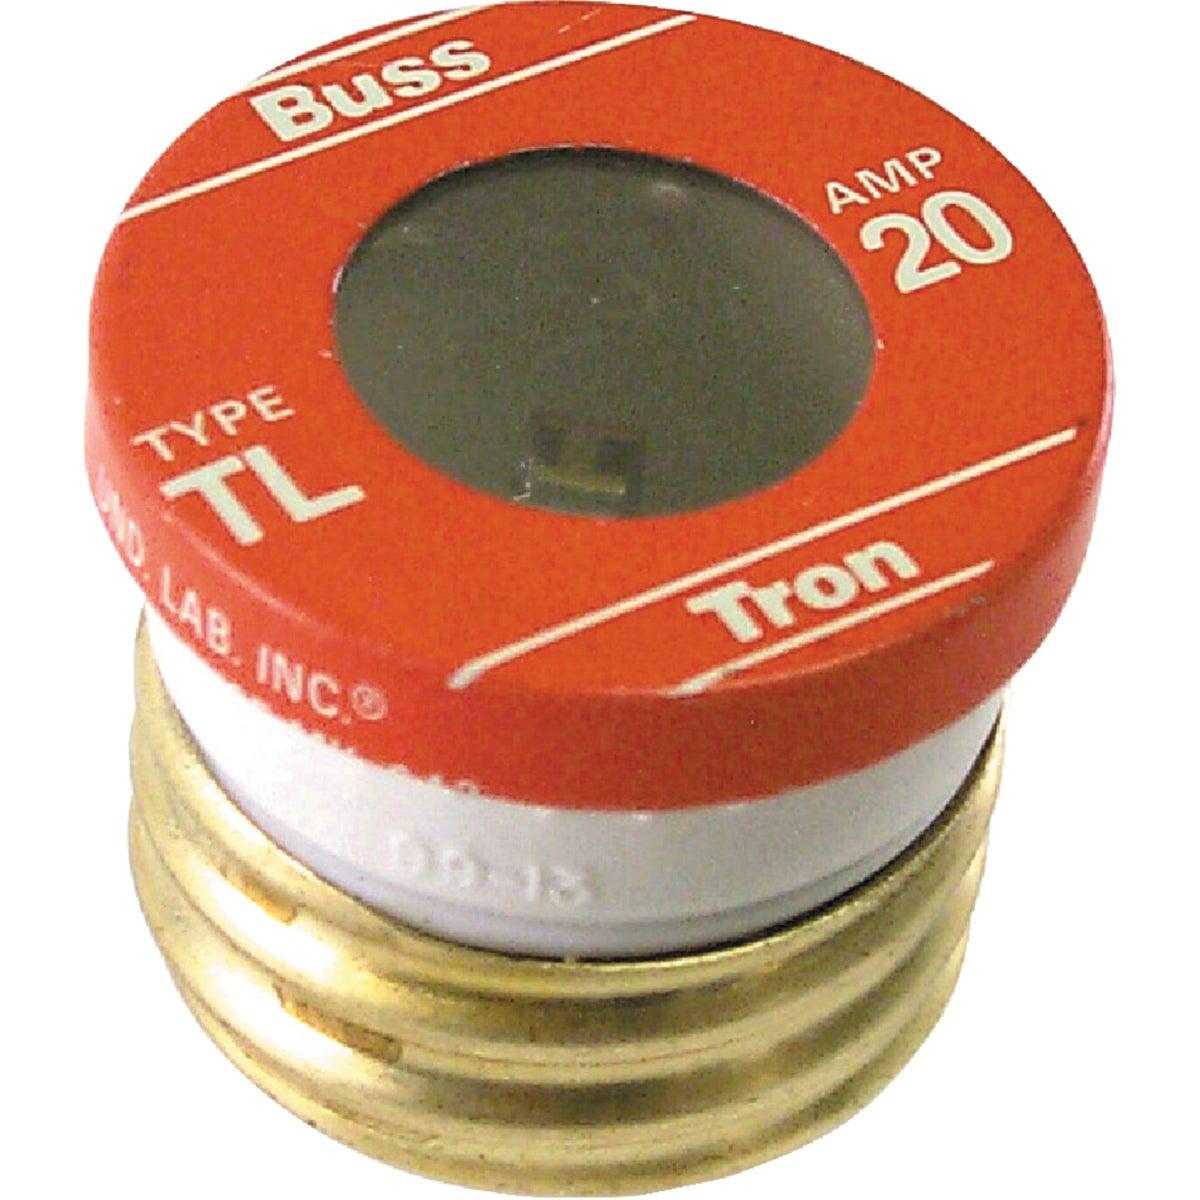 20A PLUG FUSE - BP/TL-20 by Bussmann Cooper